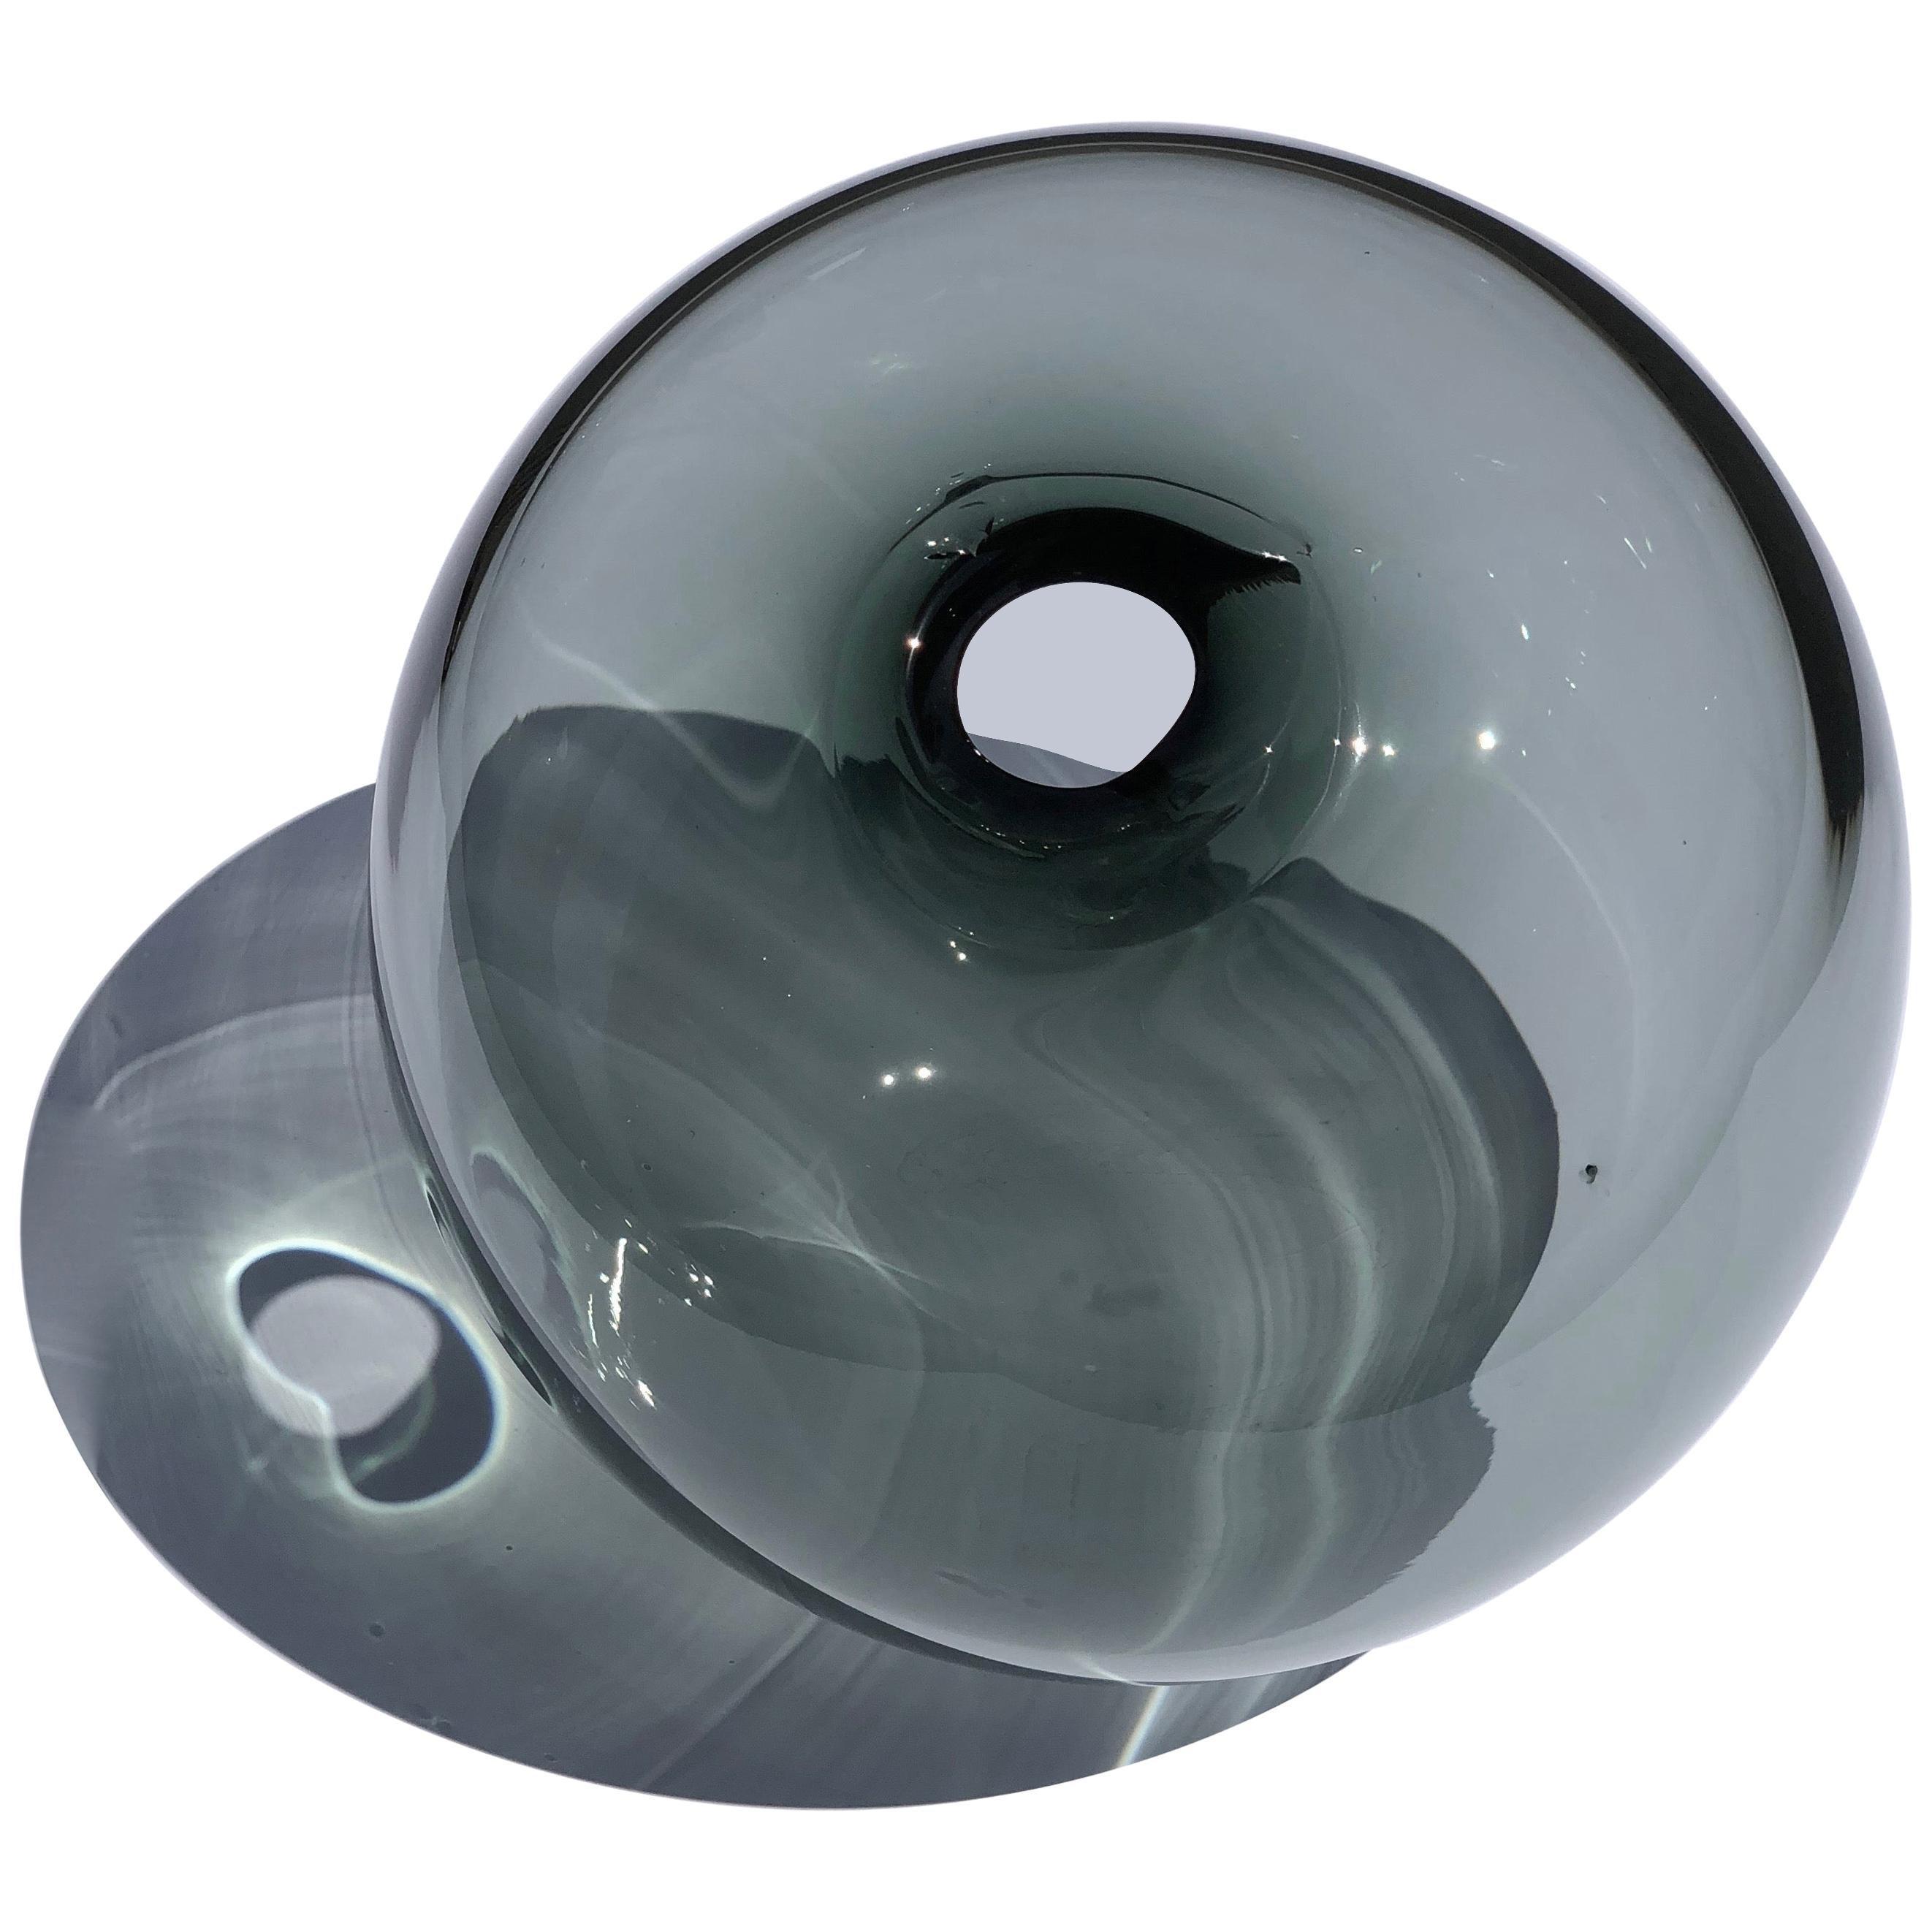 Contemporary Czech Studio Glass Vase in Smoky Grey Color